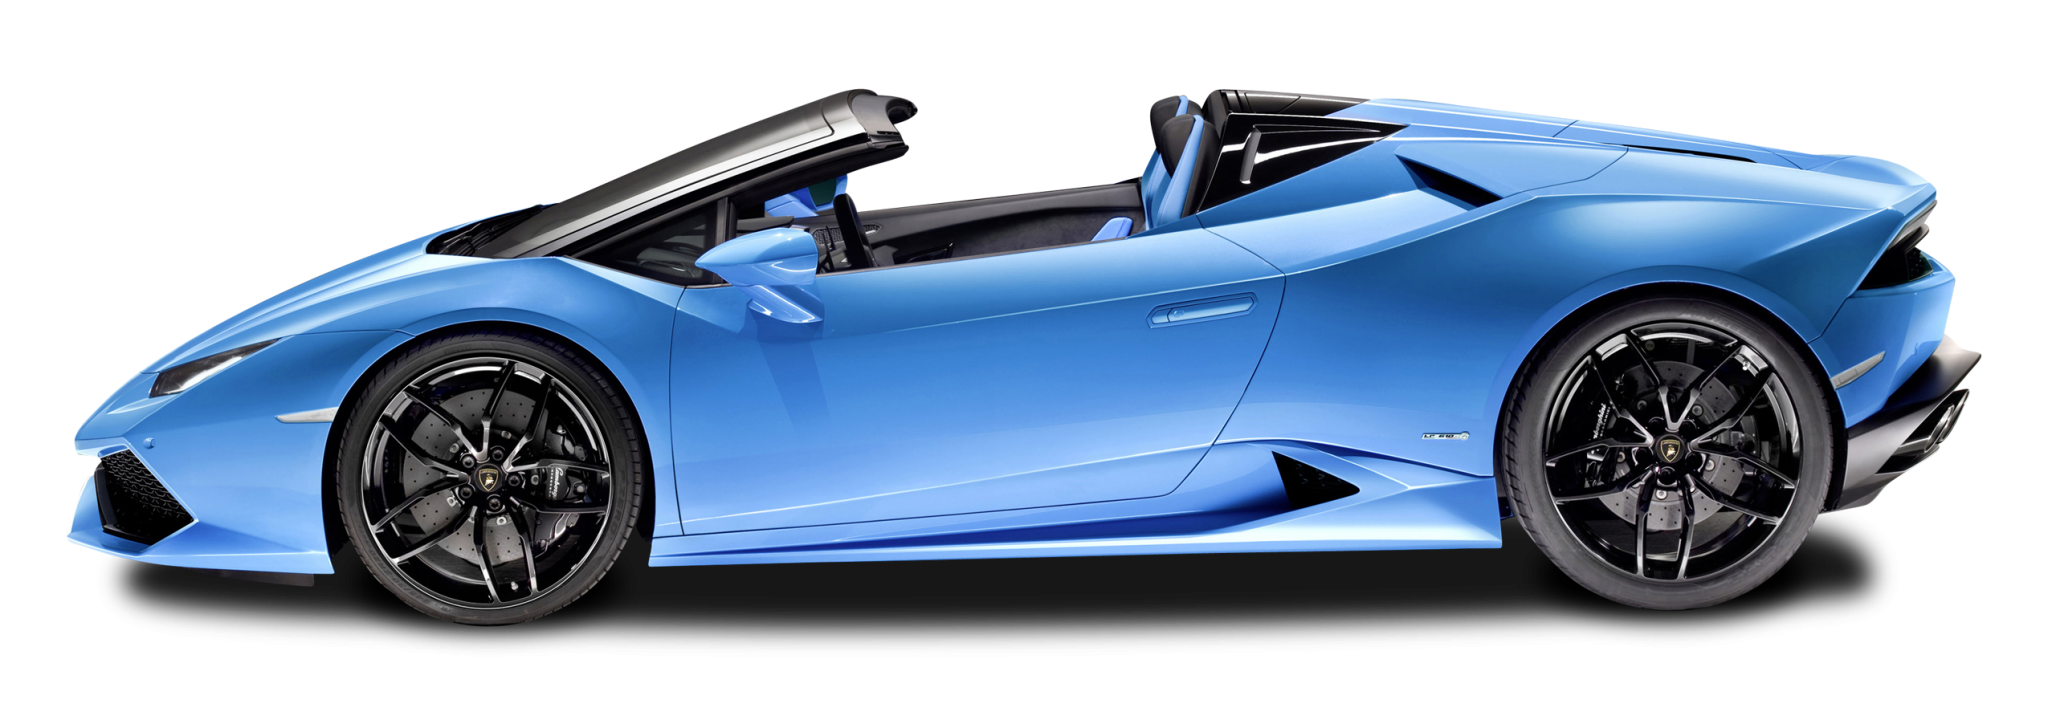 Lamborghini Alquiler venta renting coches de lujo en Madrid